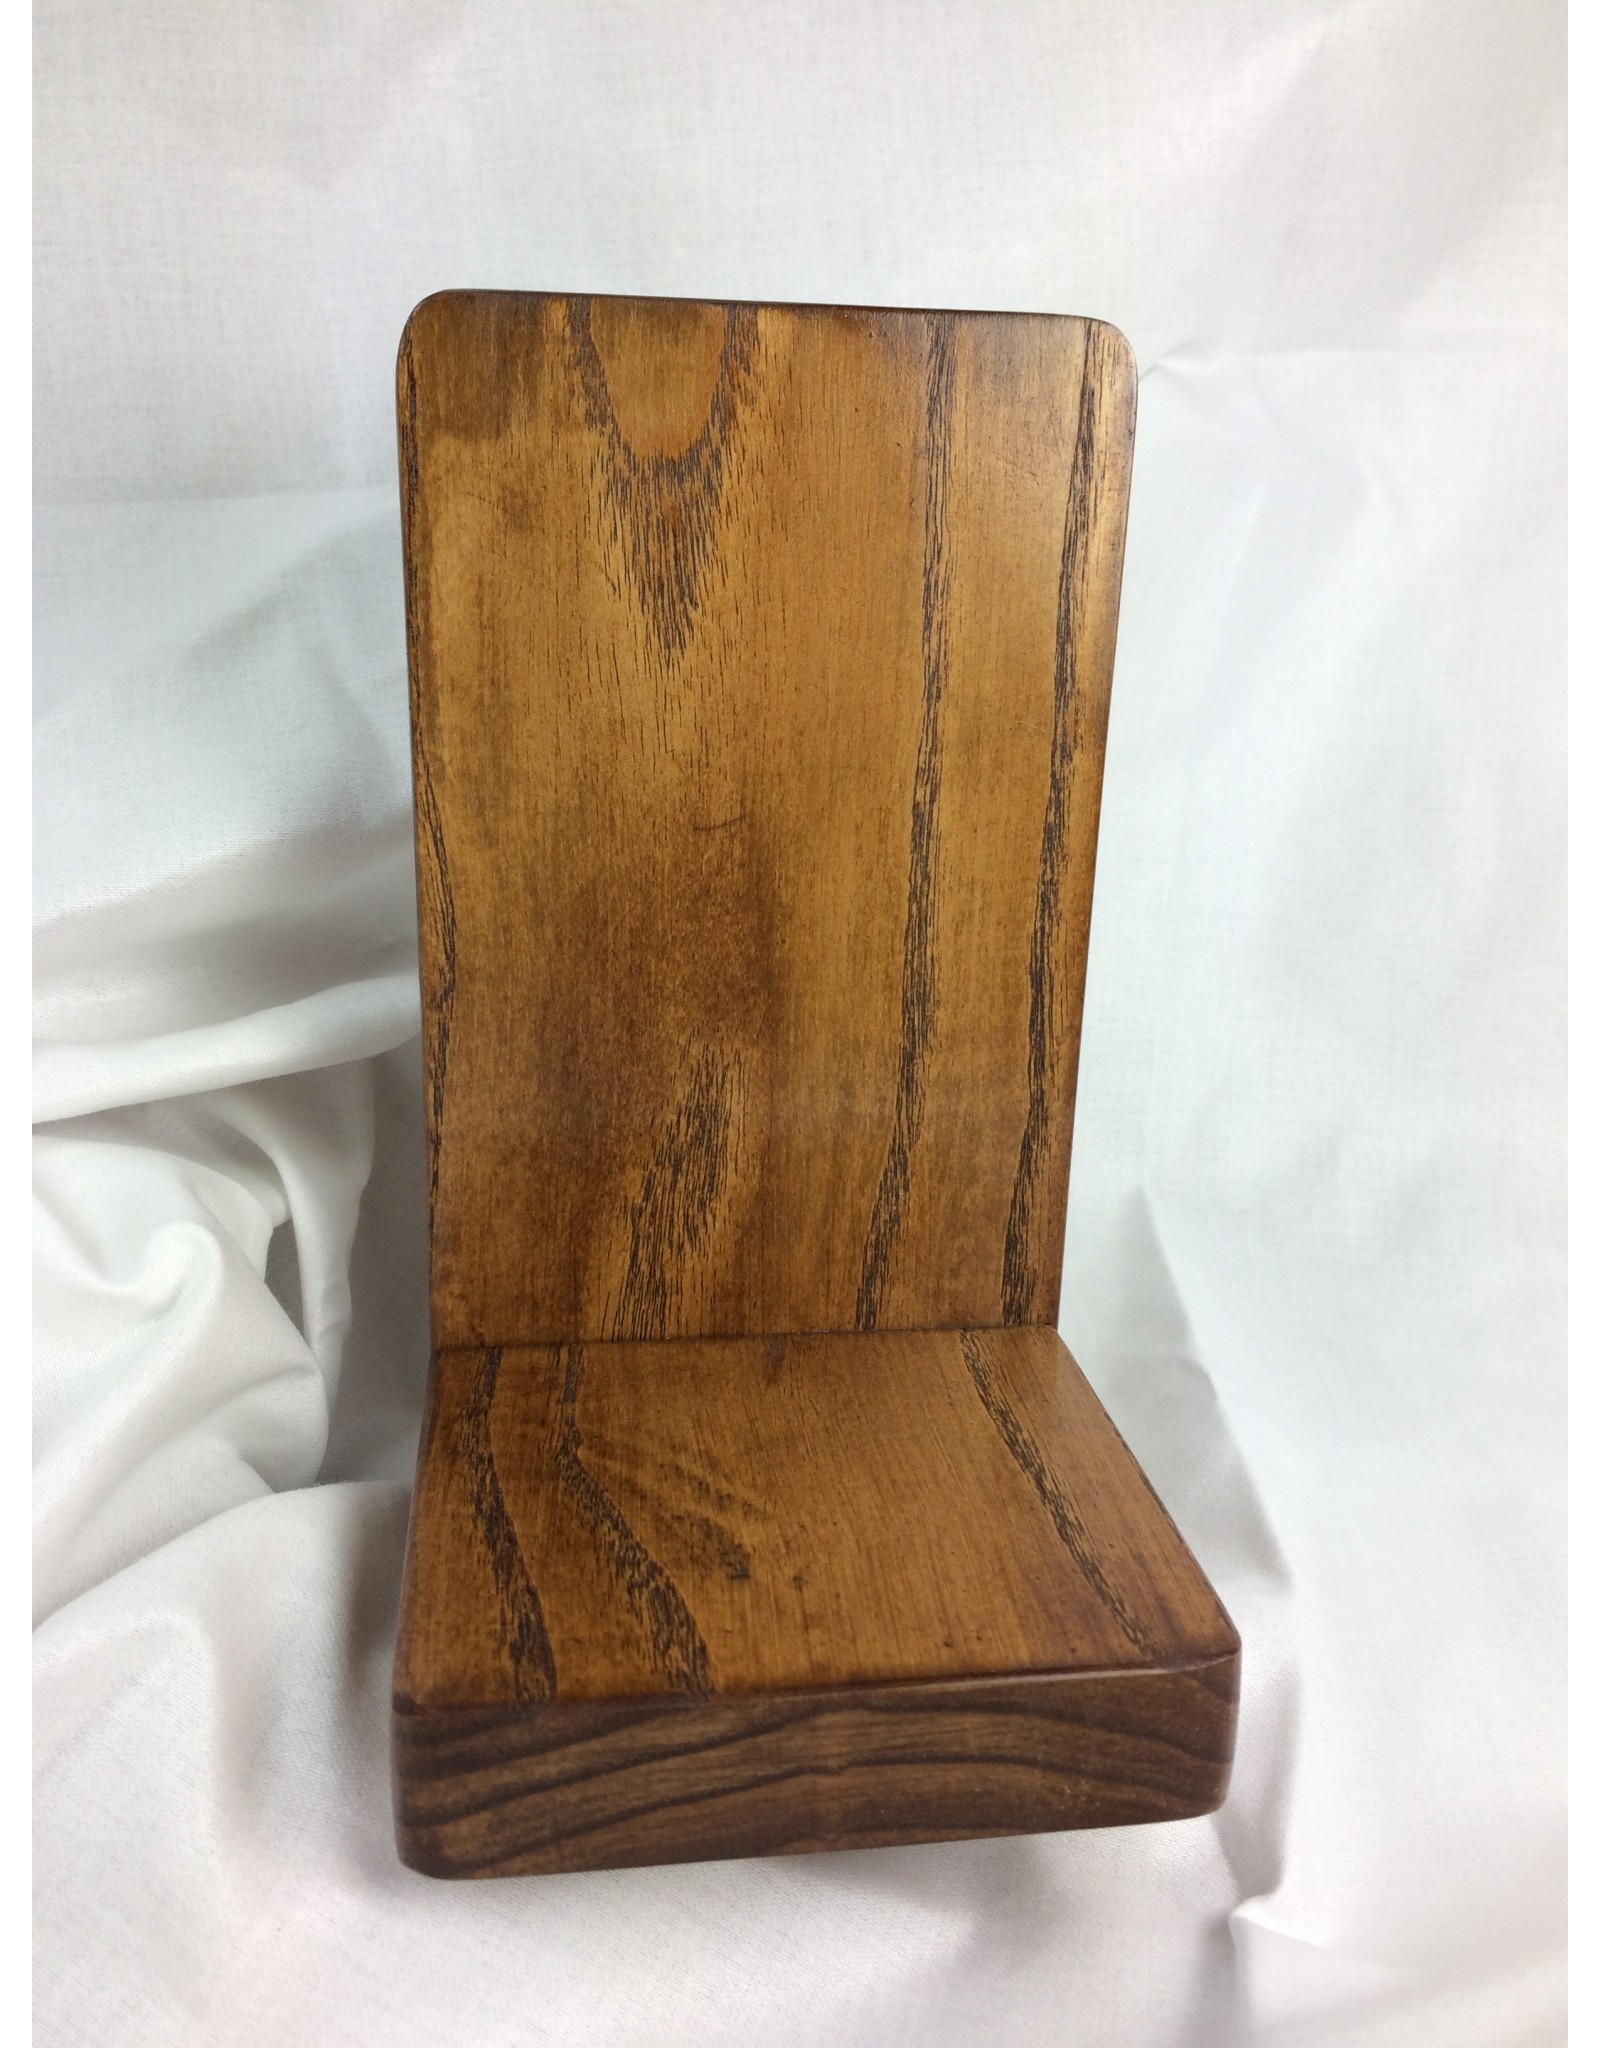 Standard Display Shelf 4x8, Ash finished w/ Early American/Tung Oil